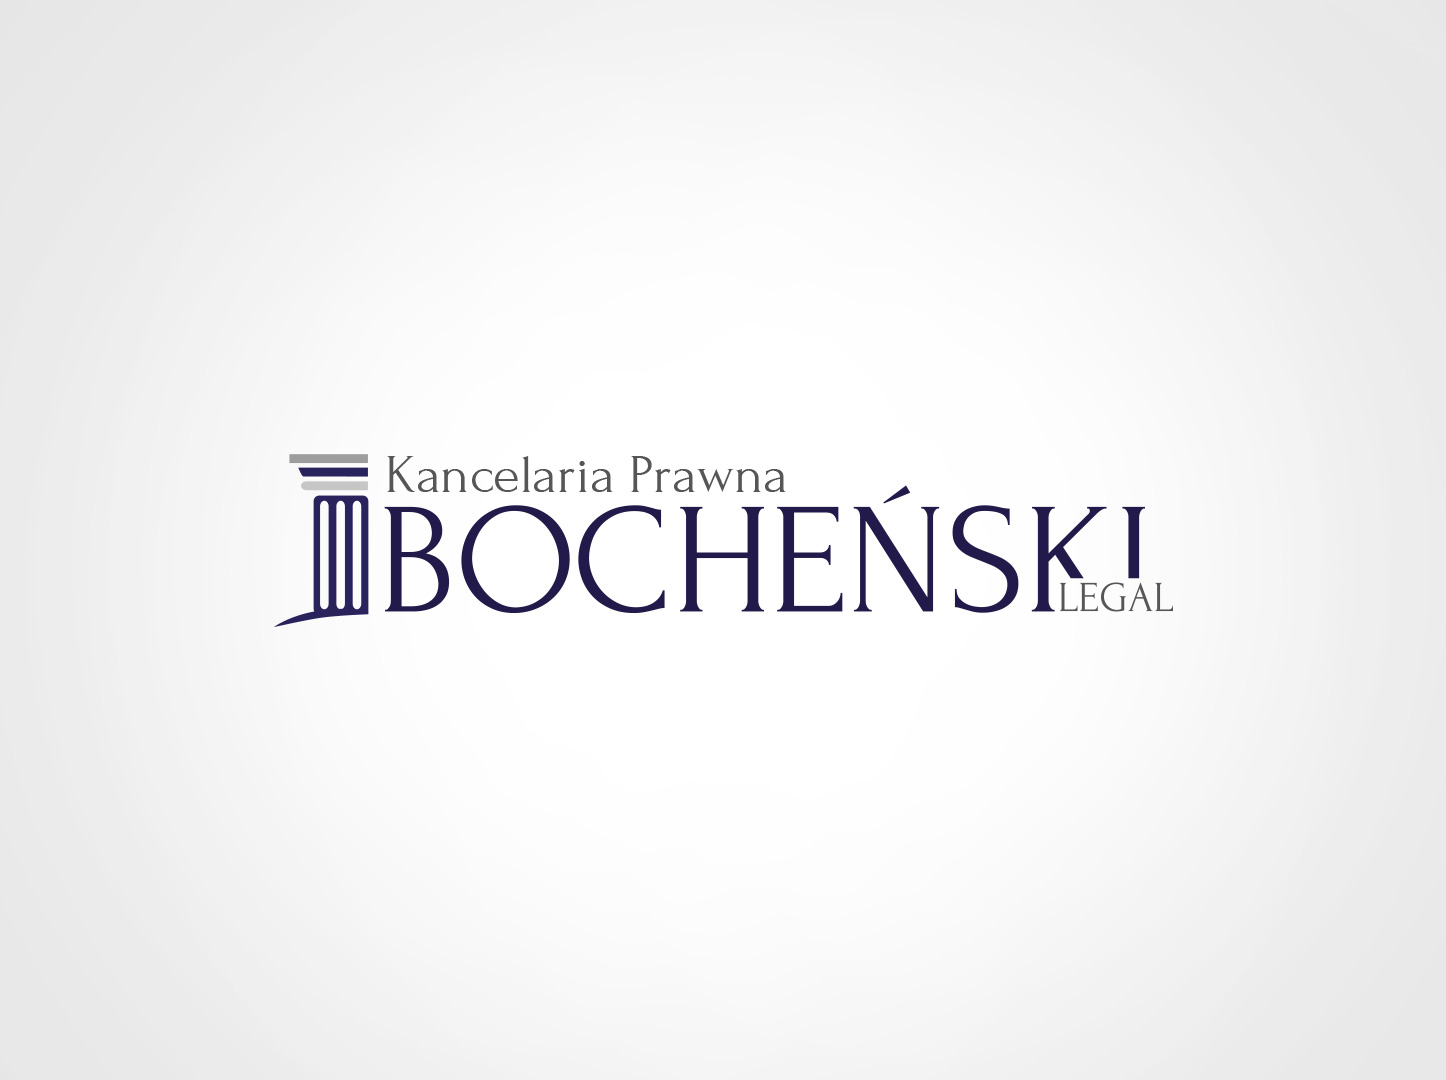 bochenski-legal-logo